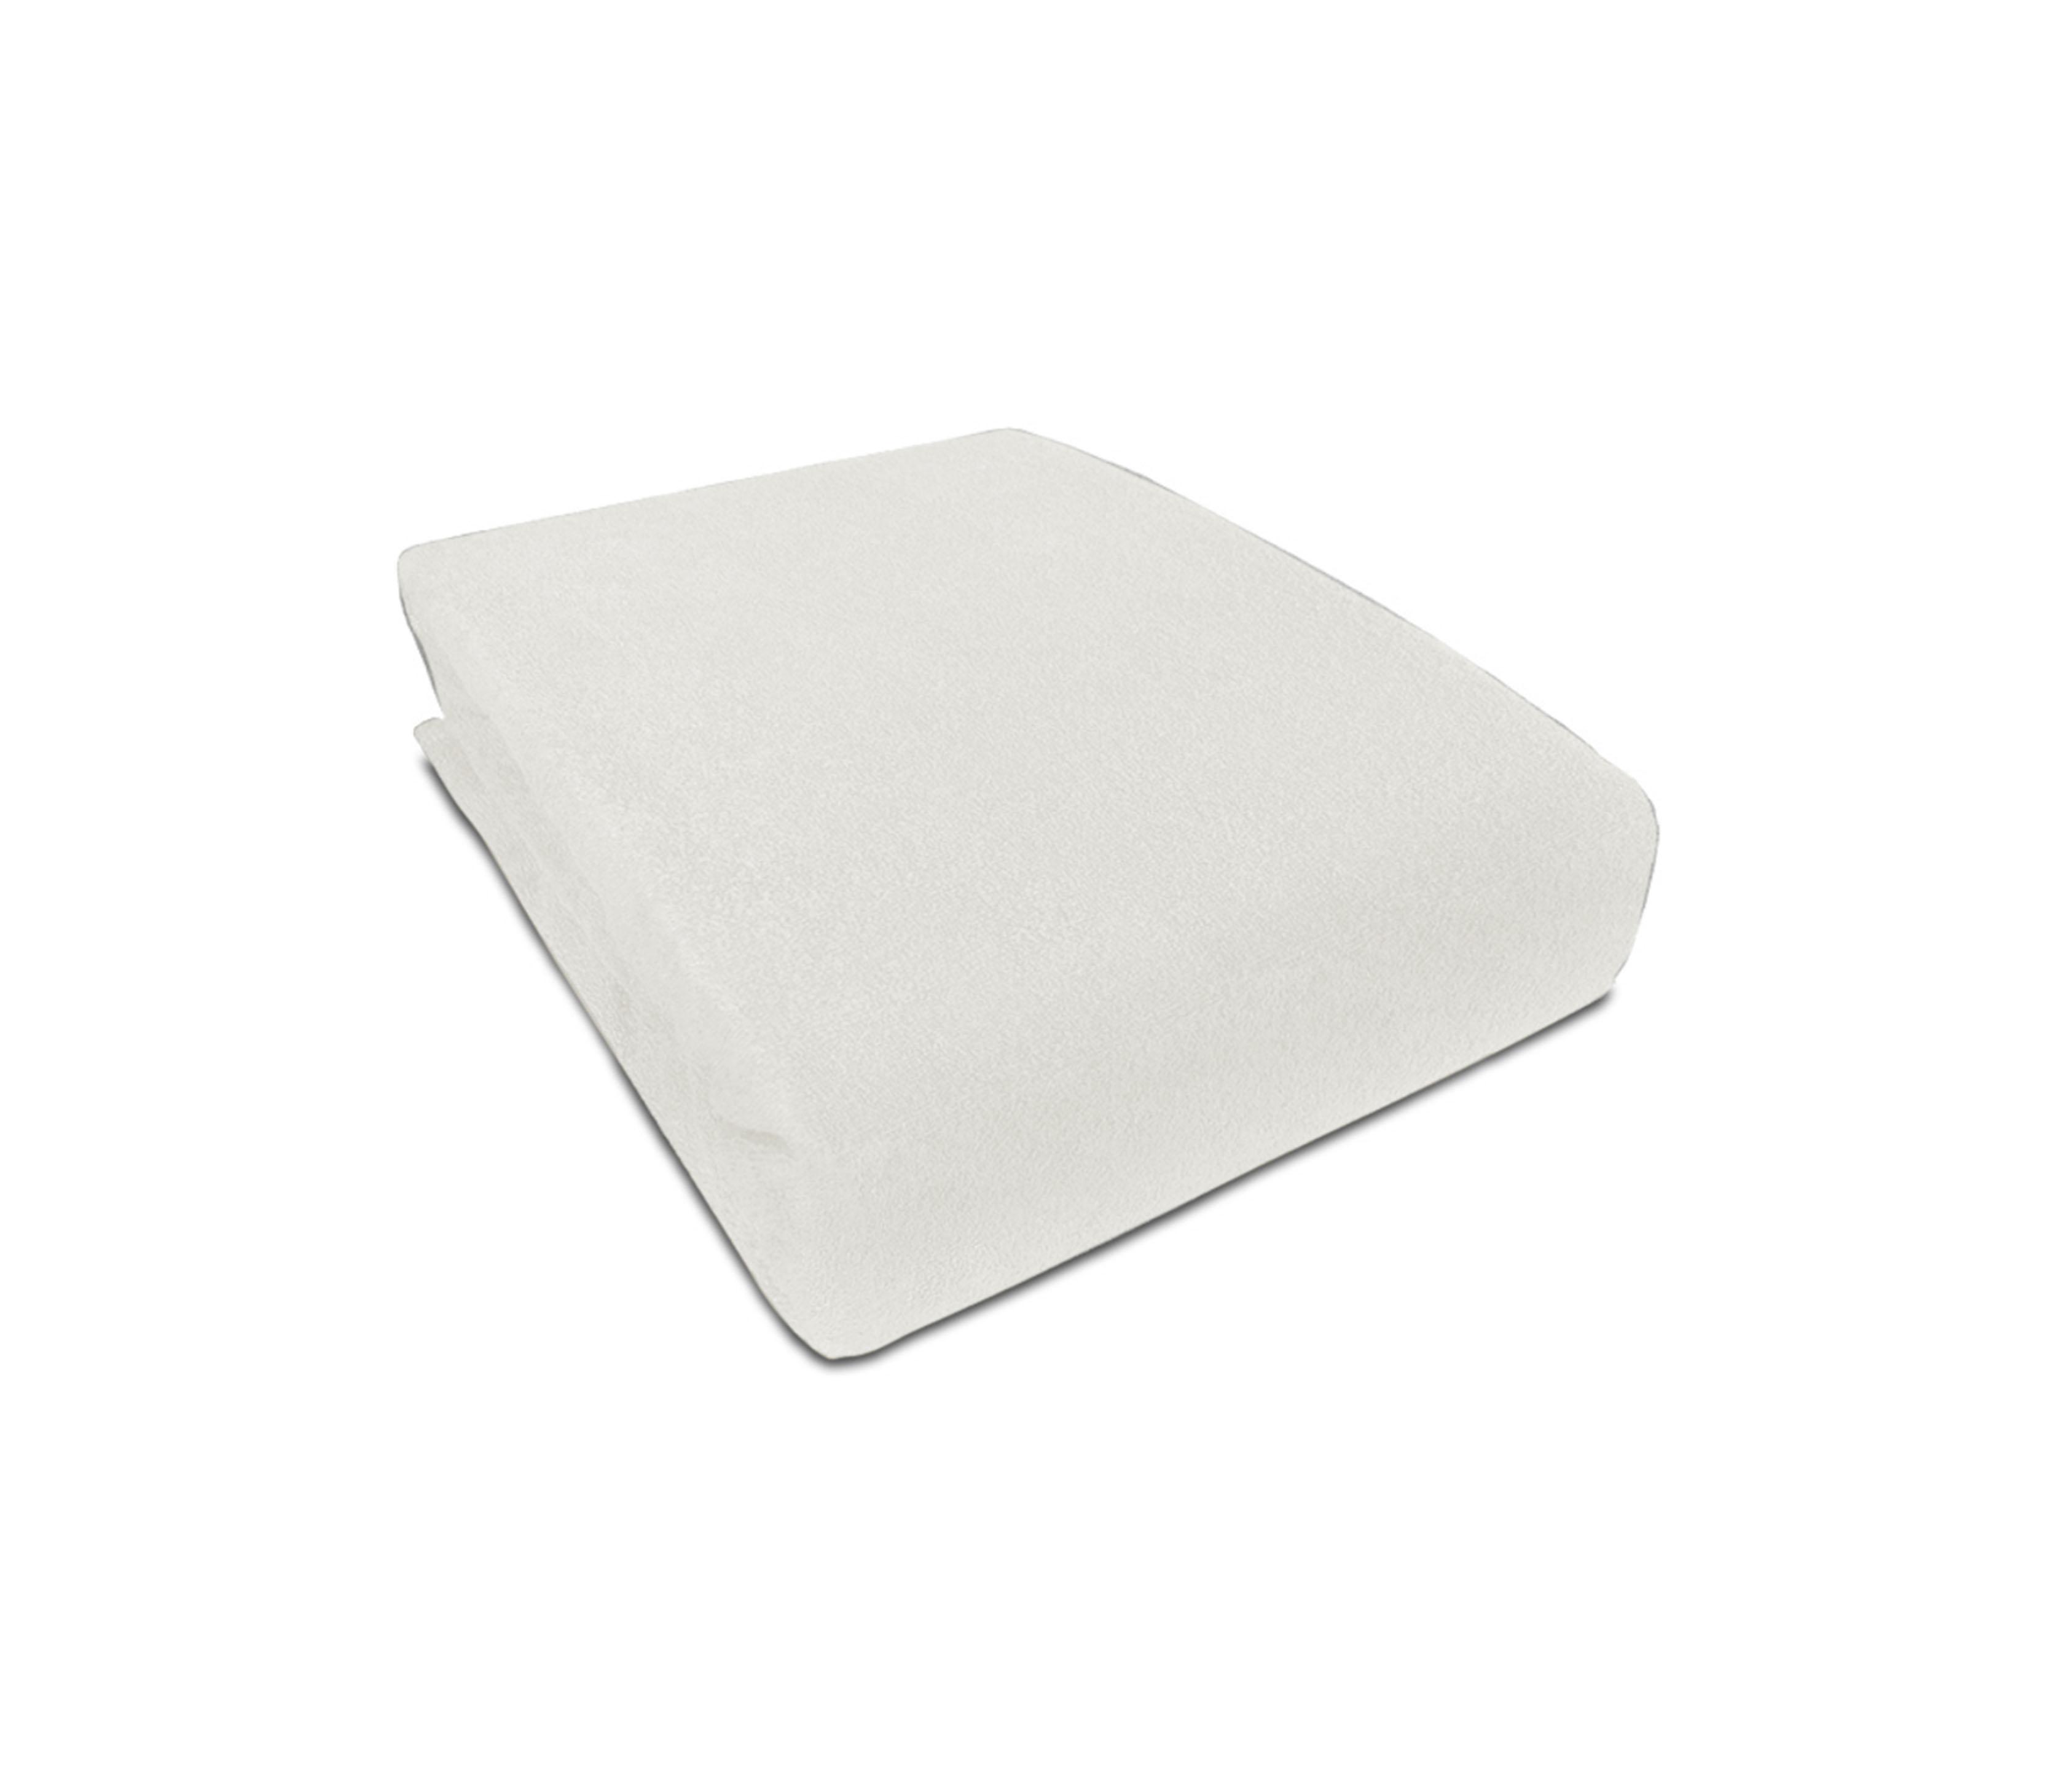 Aga Prostěradlo FROTÉ 90x200 cm Barva prostěradla: Bílá